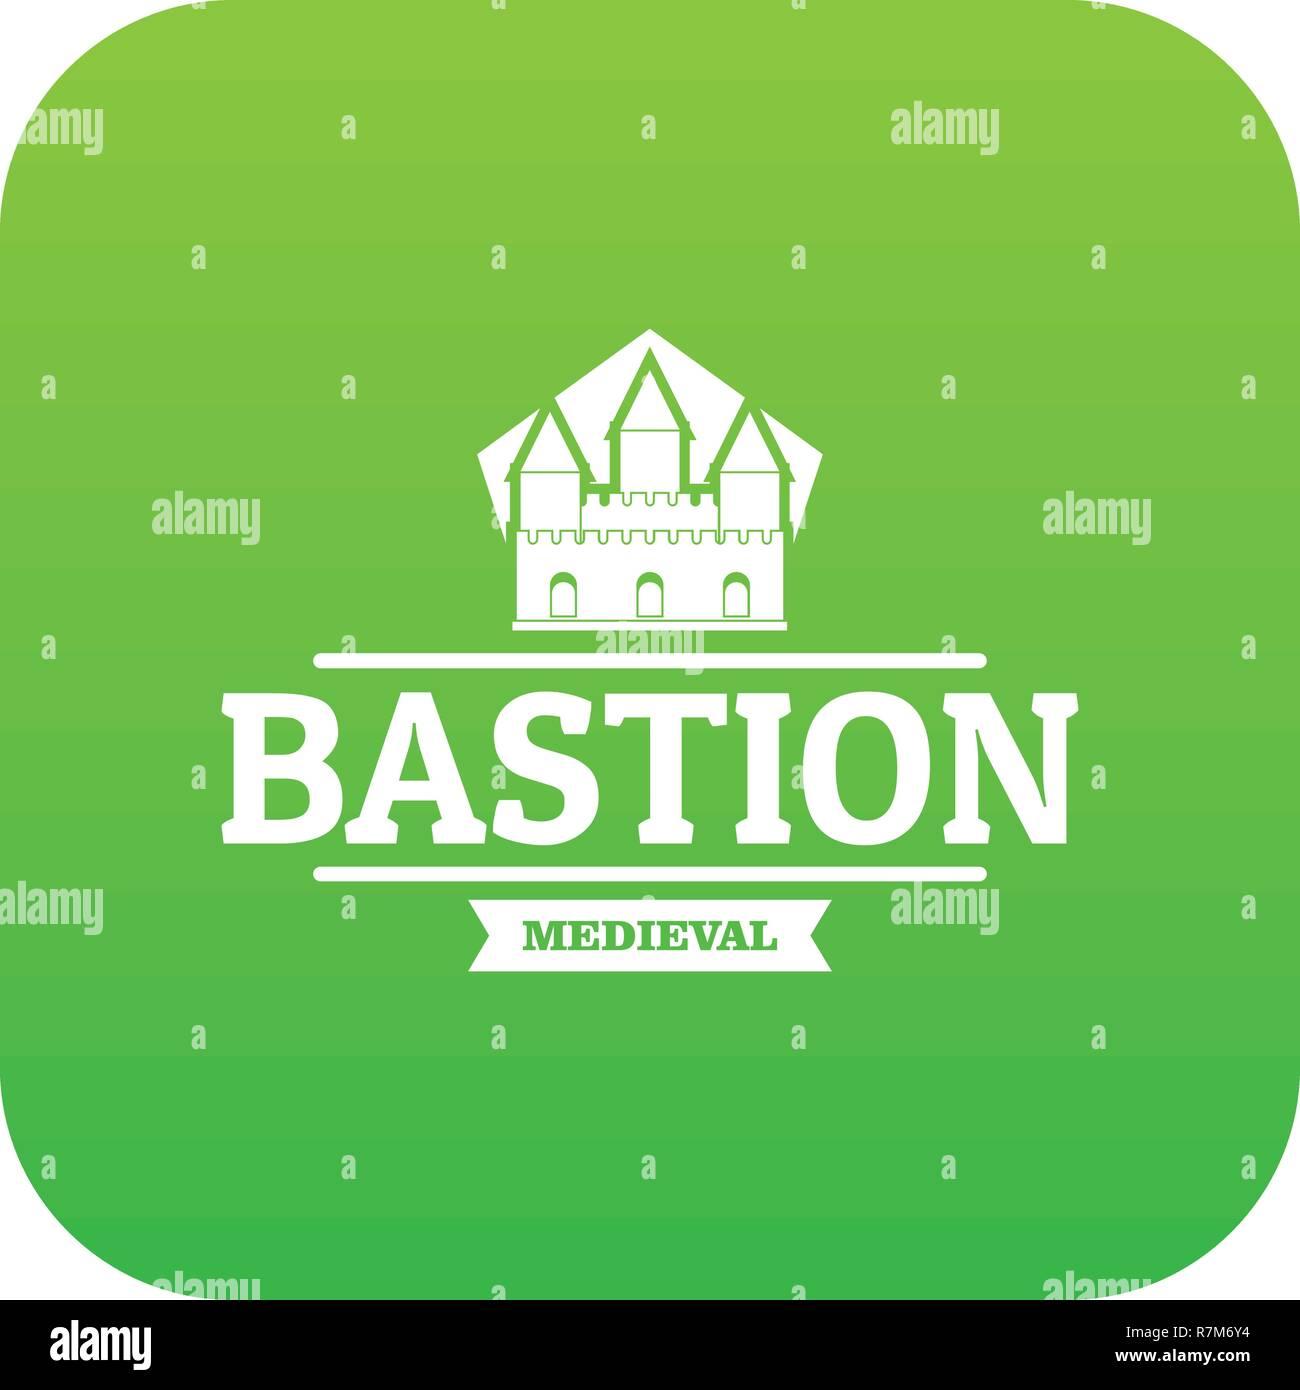 Bastion medieval icon green vector - Stock Vector